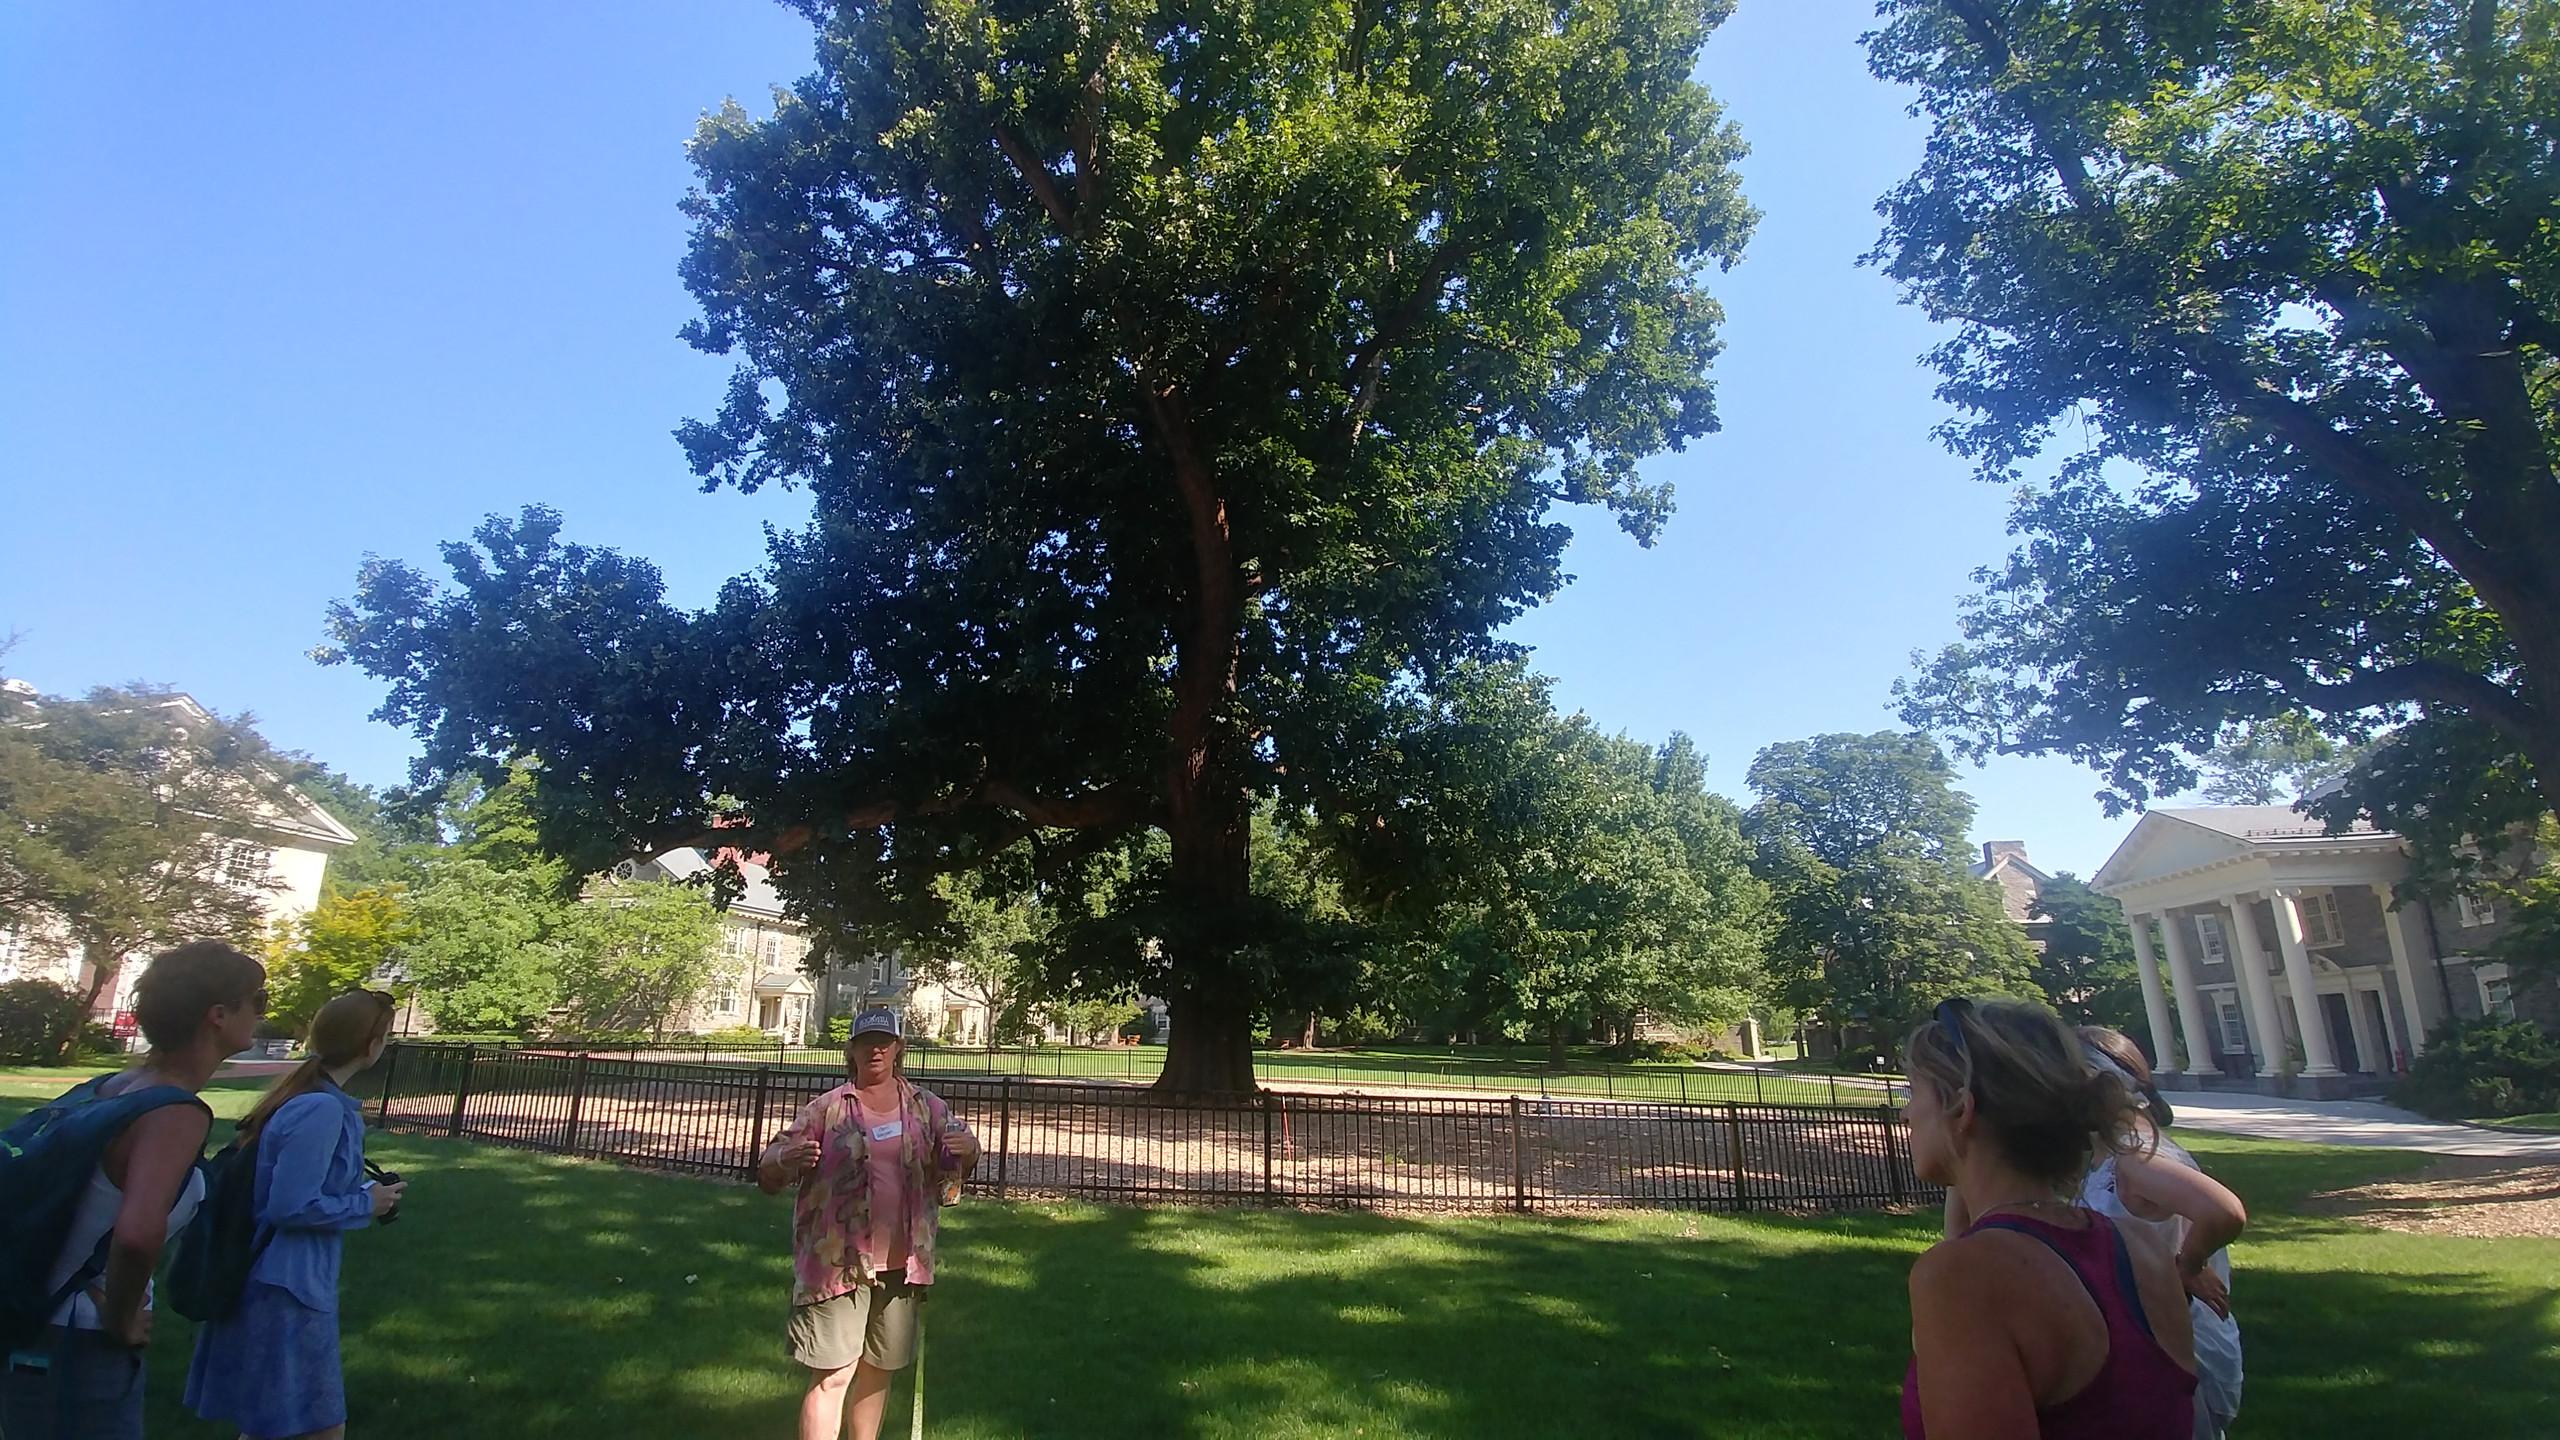 The Commencement Oak, a State Champion Quercus bicolor